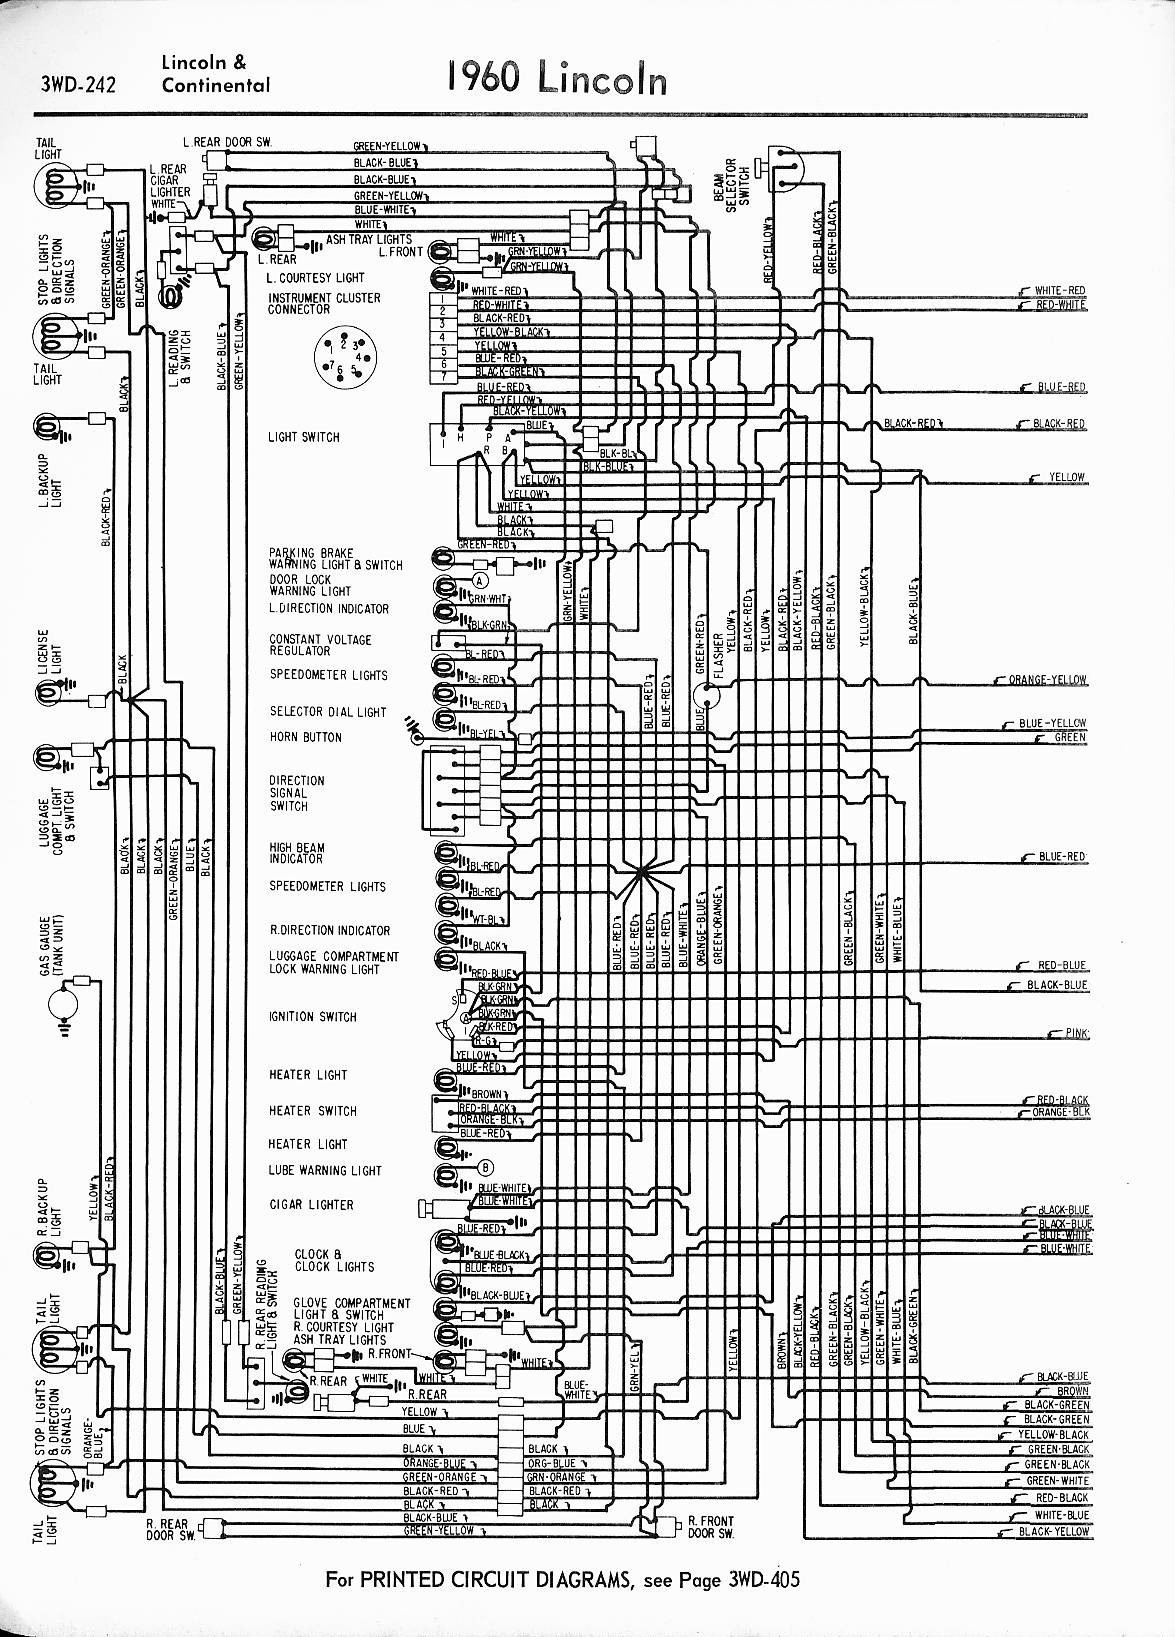 2001 Lincoln town Car Fuse Box Diagram Wiring Diagram 2001 Lincoln Ls Rear Worksheet and Wiring Diagram • Of 2001 Lincoln town Car Fuse Box Diagram